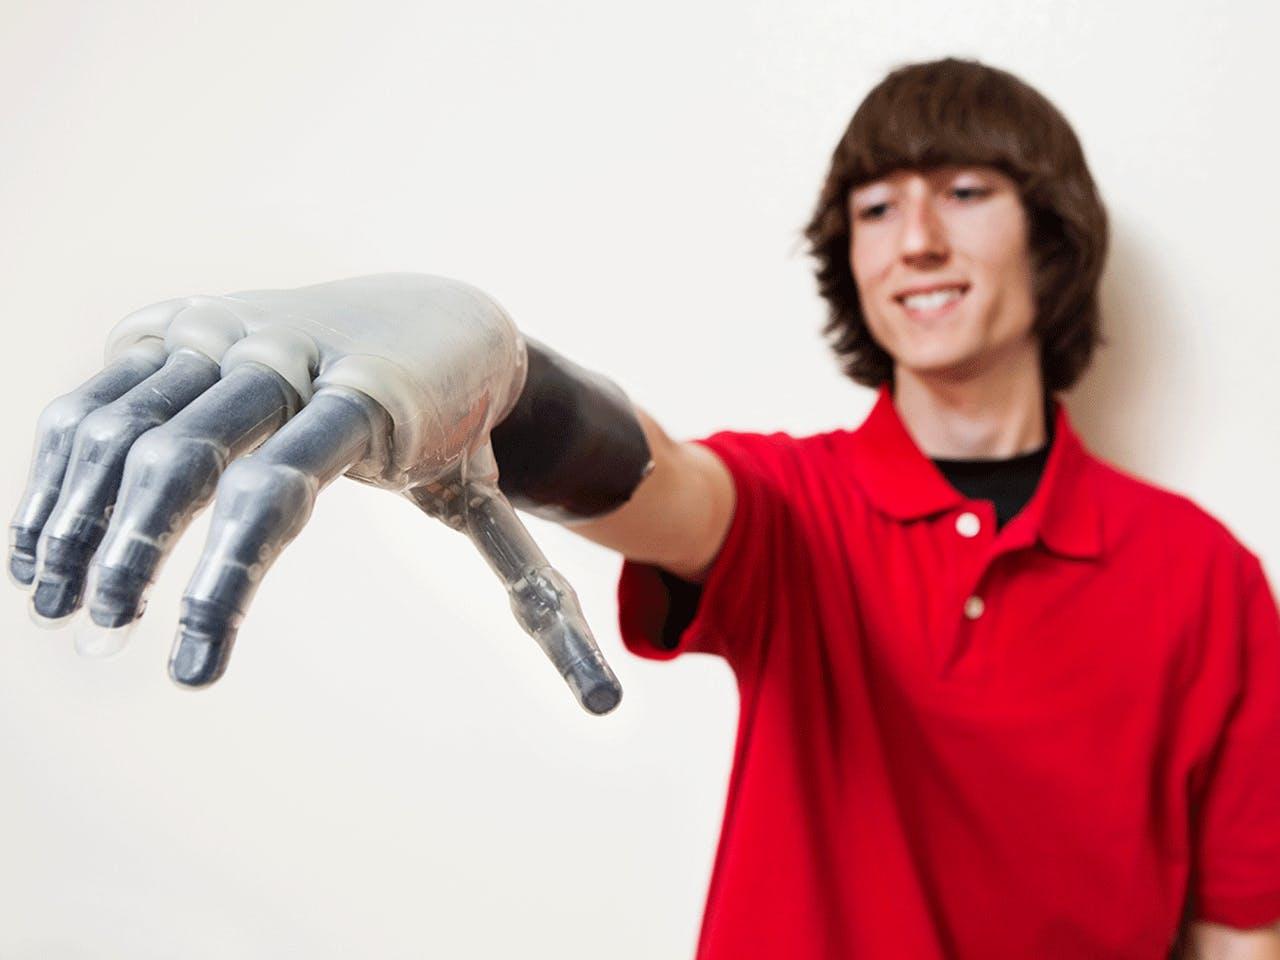 Restoring the Sixth Sense of Lost Limbs